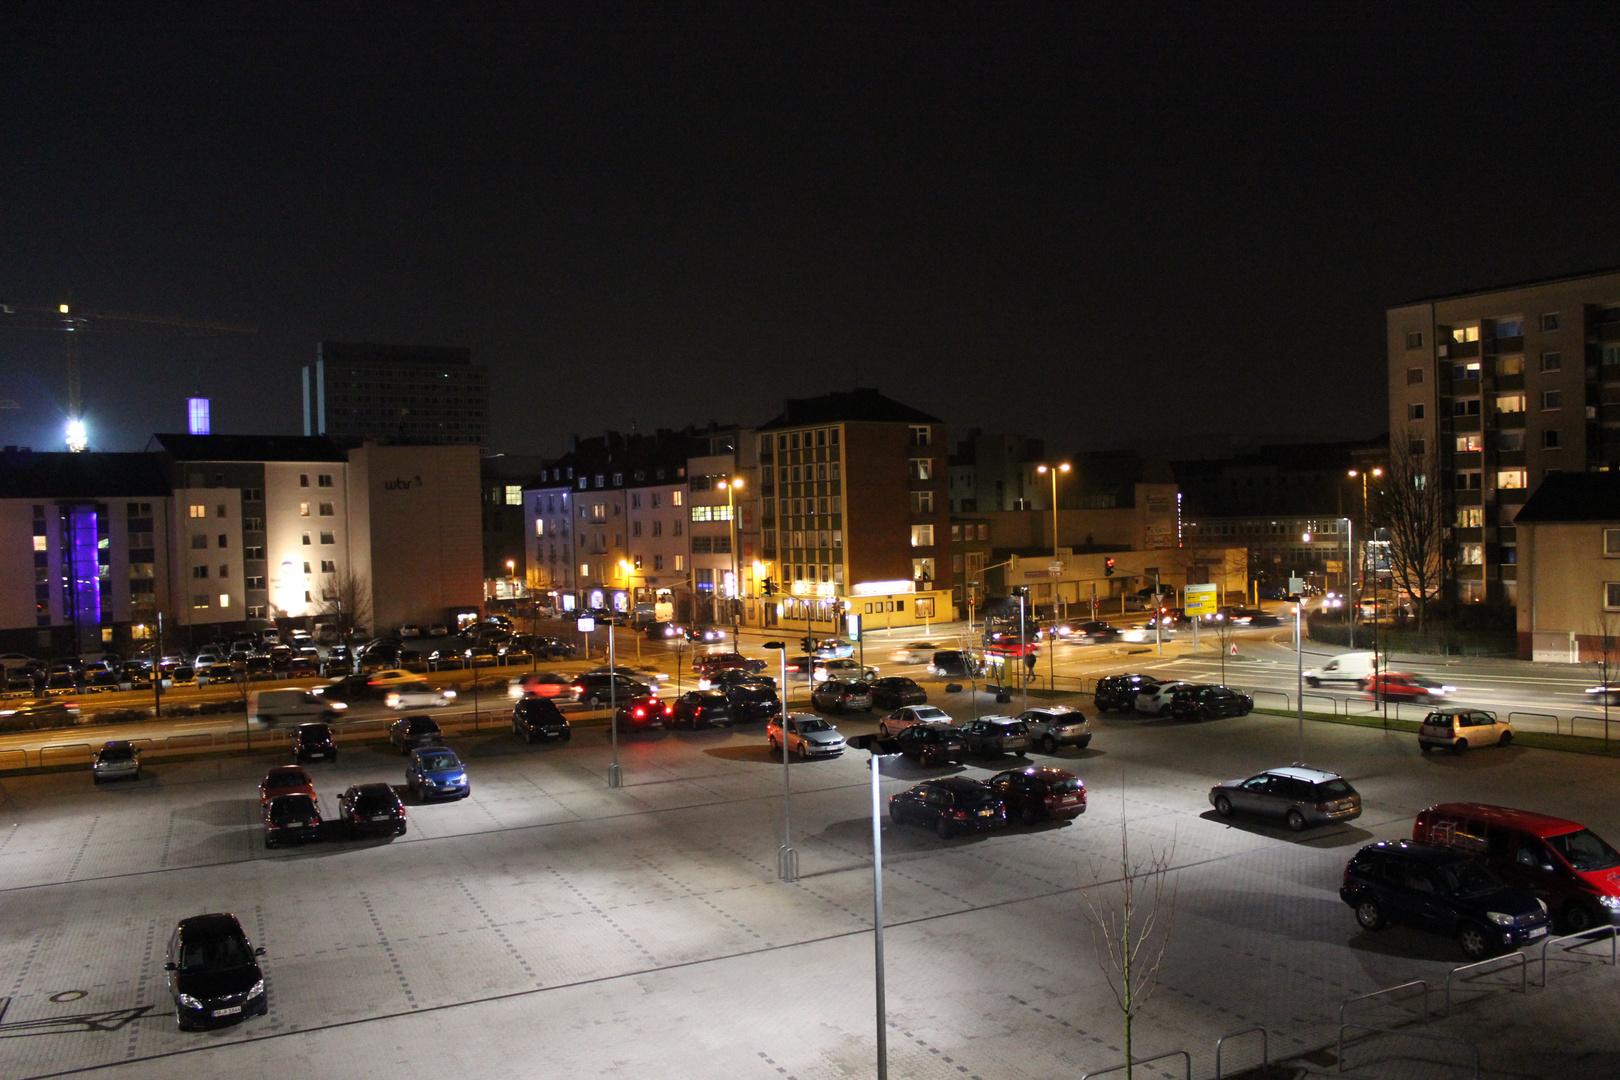 Nachtleben in Hagen